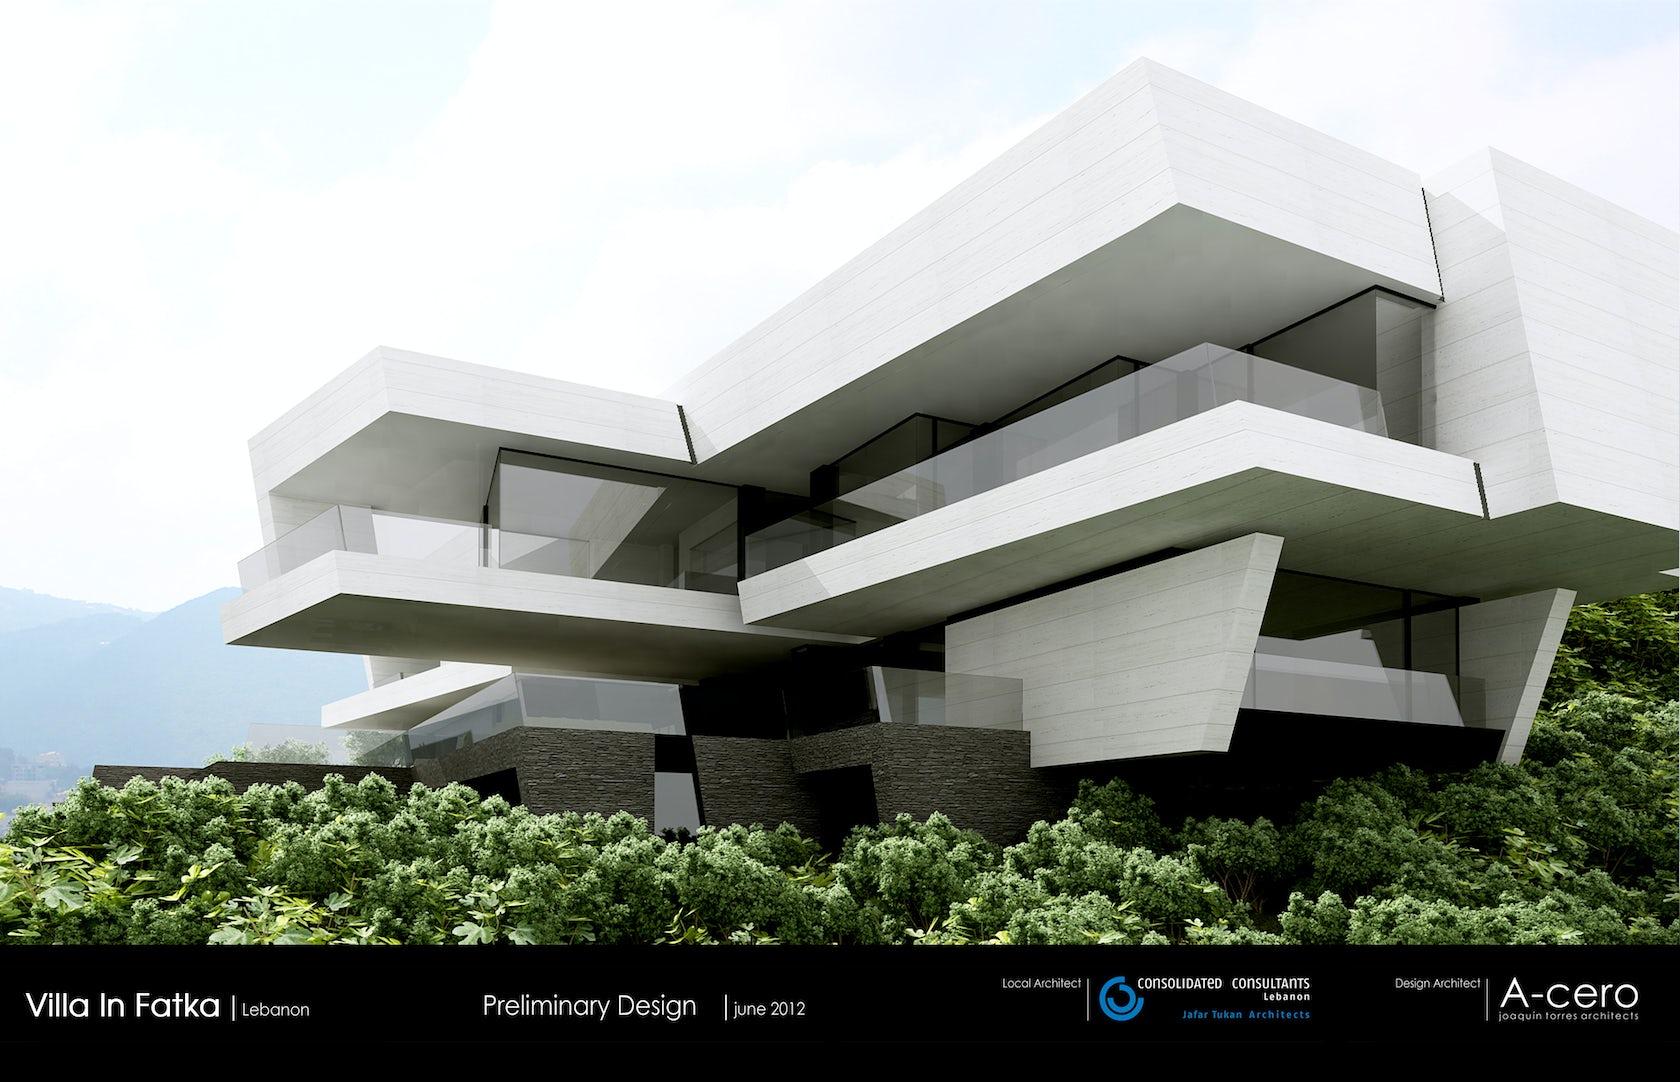 Villa in fatka lebanon by a cero joaqu n torres - A cero joaquin torres ...